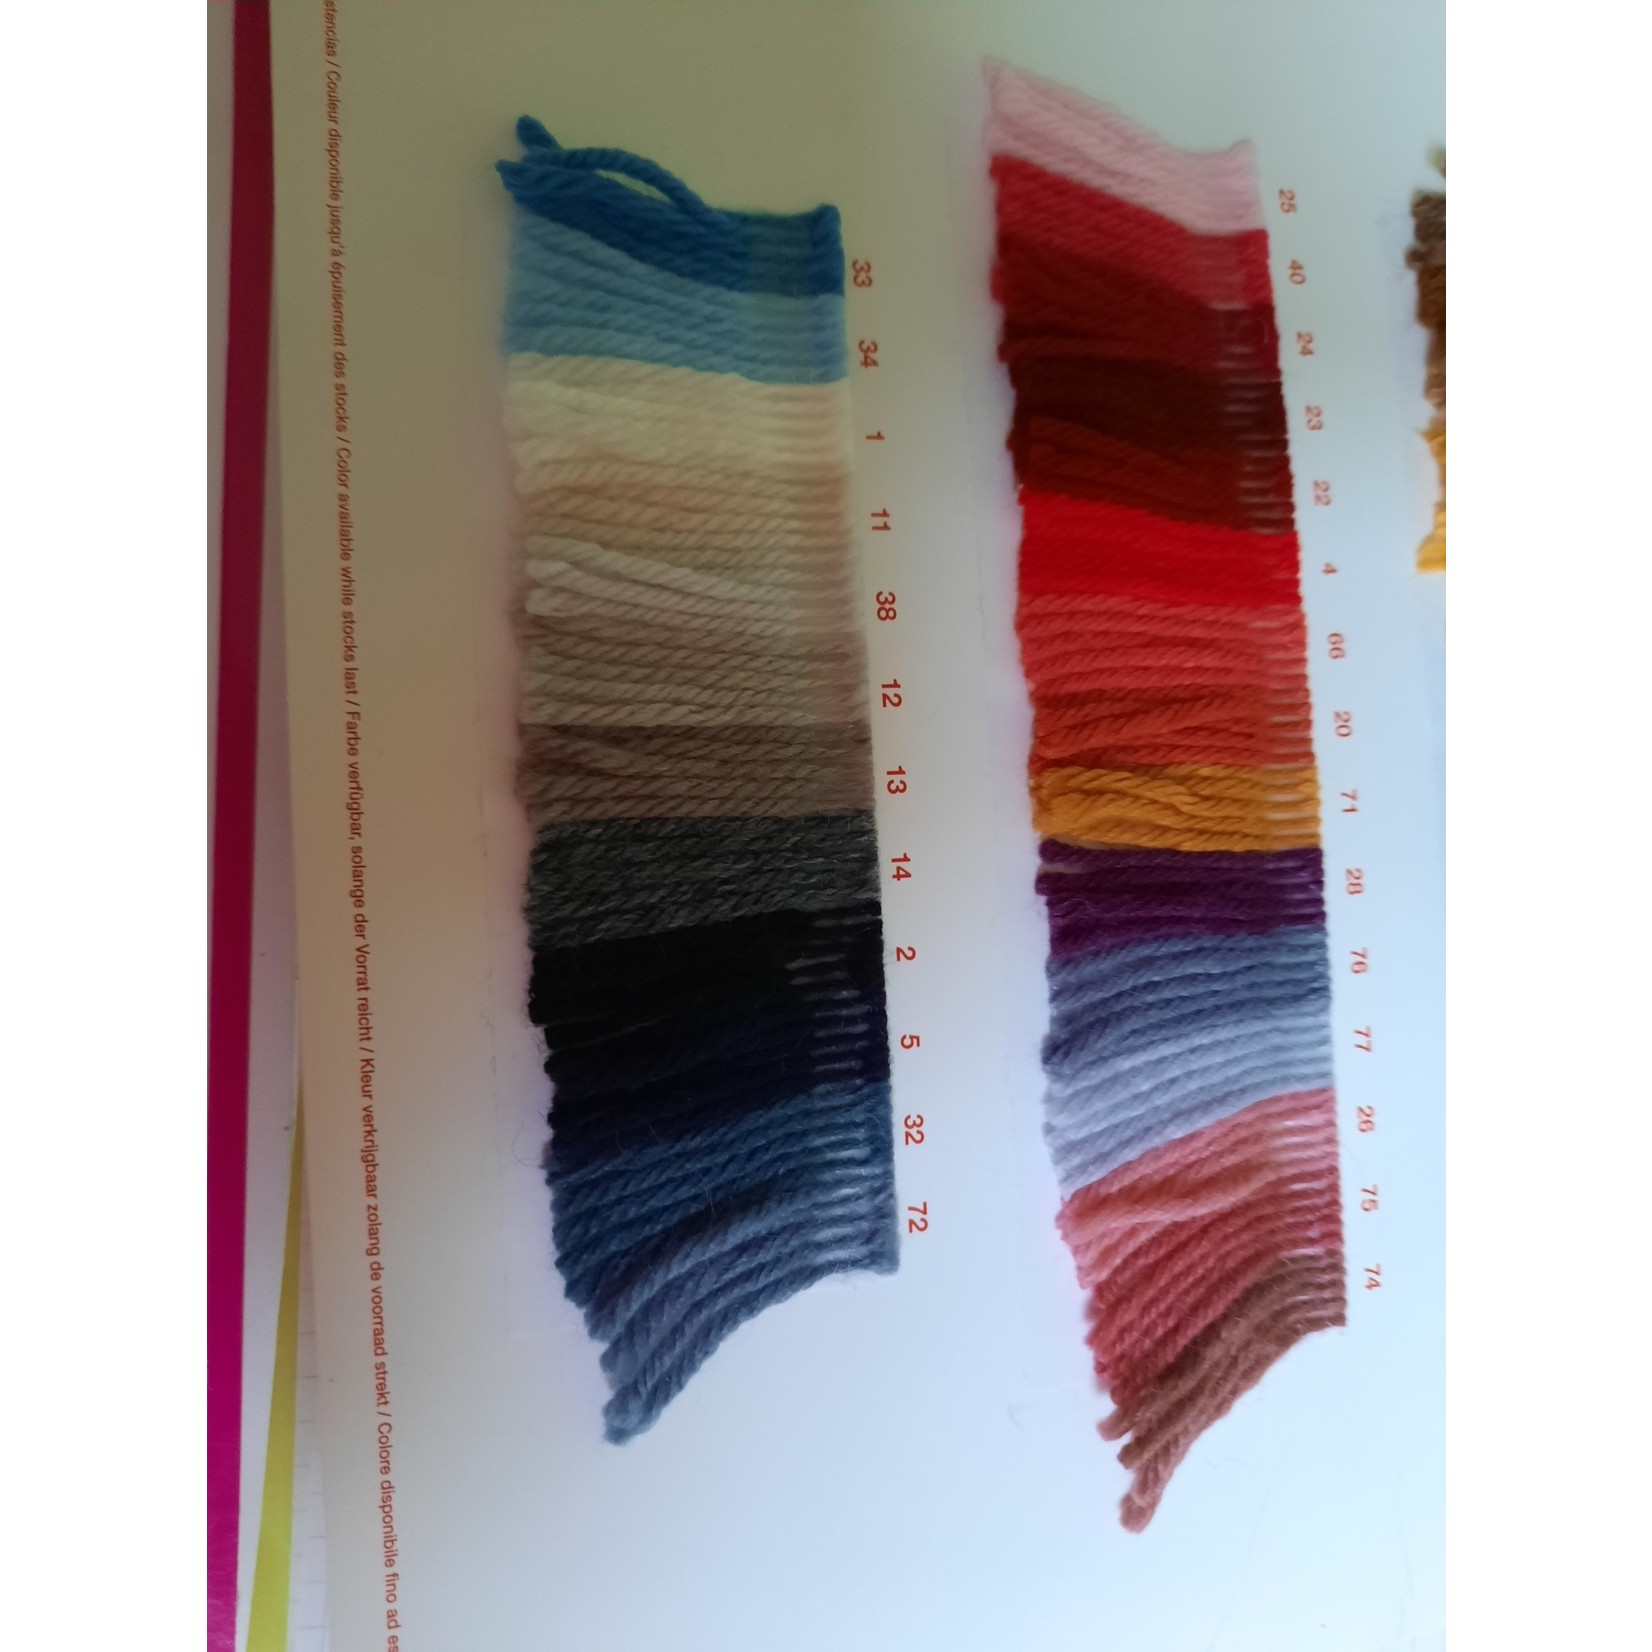 Katia Basic Merino - kleurenbundel Herst- 12 bollen 50 gr.  van 120 m.